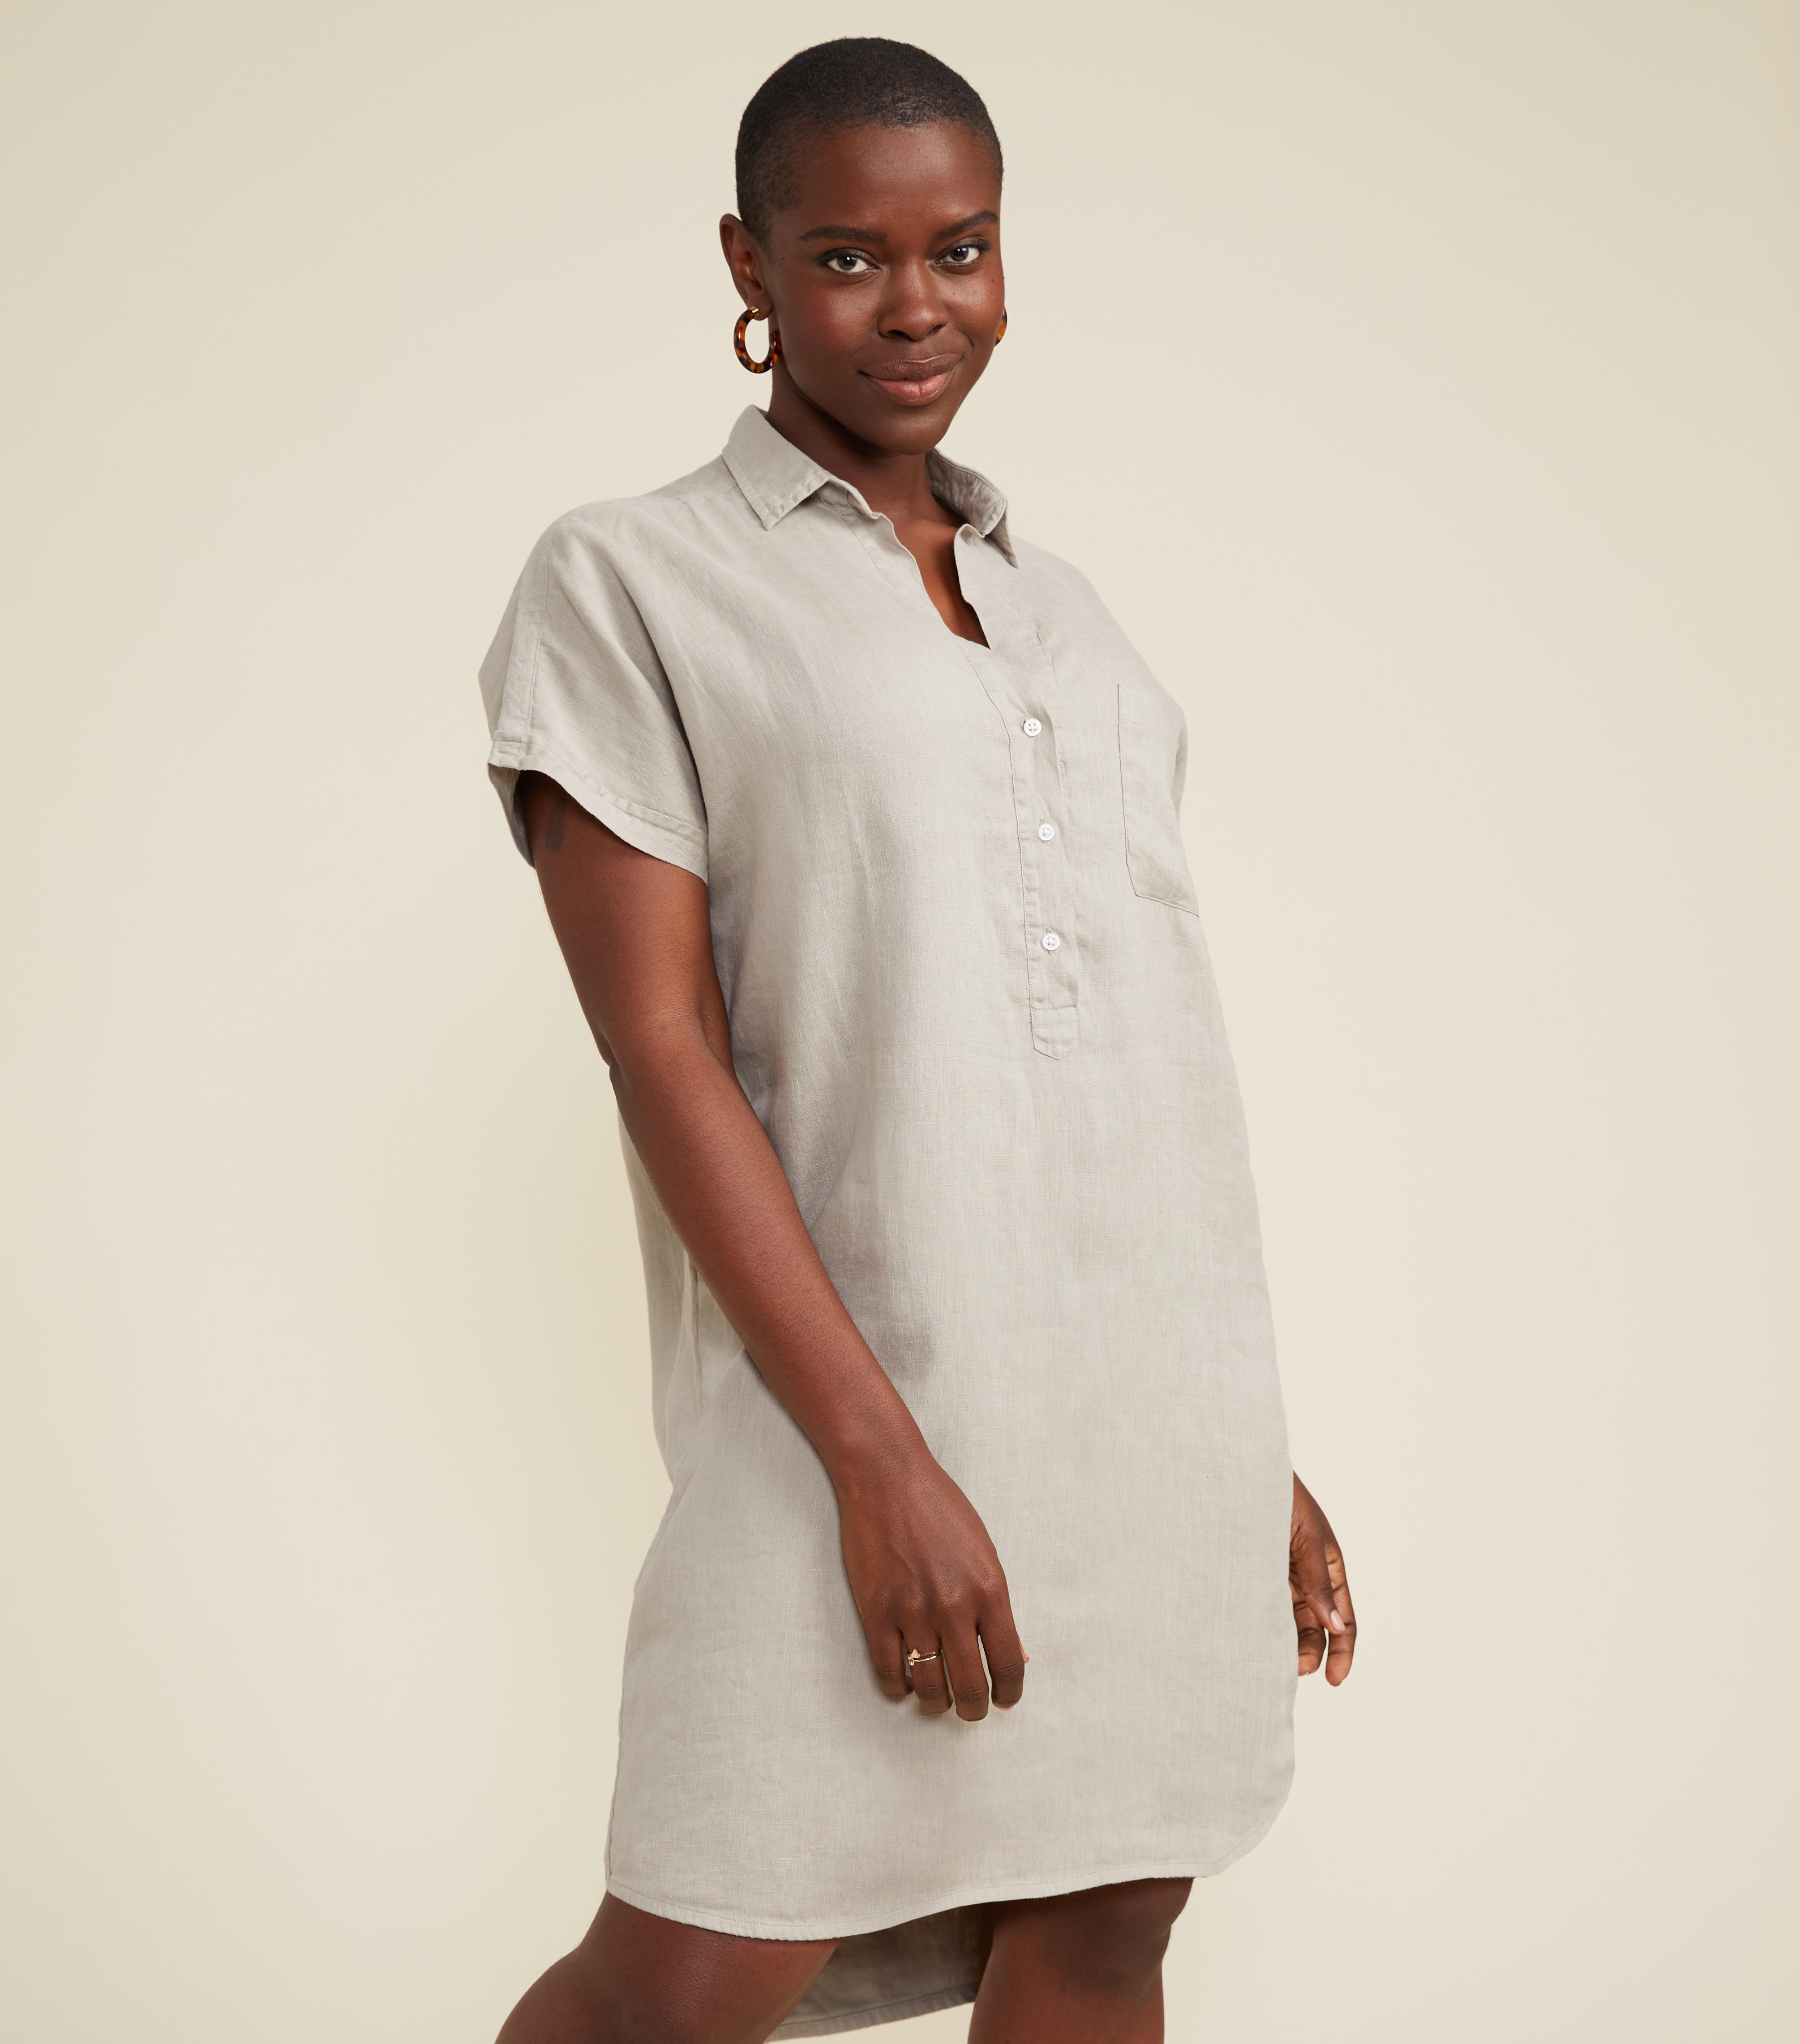 Image of The Artist Short Sleeve Dress Sand, Tumbled Linen